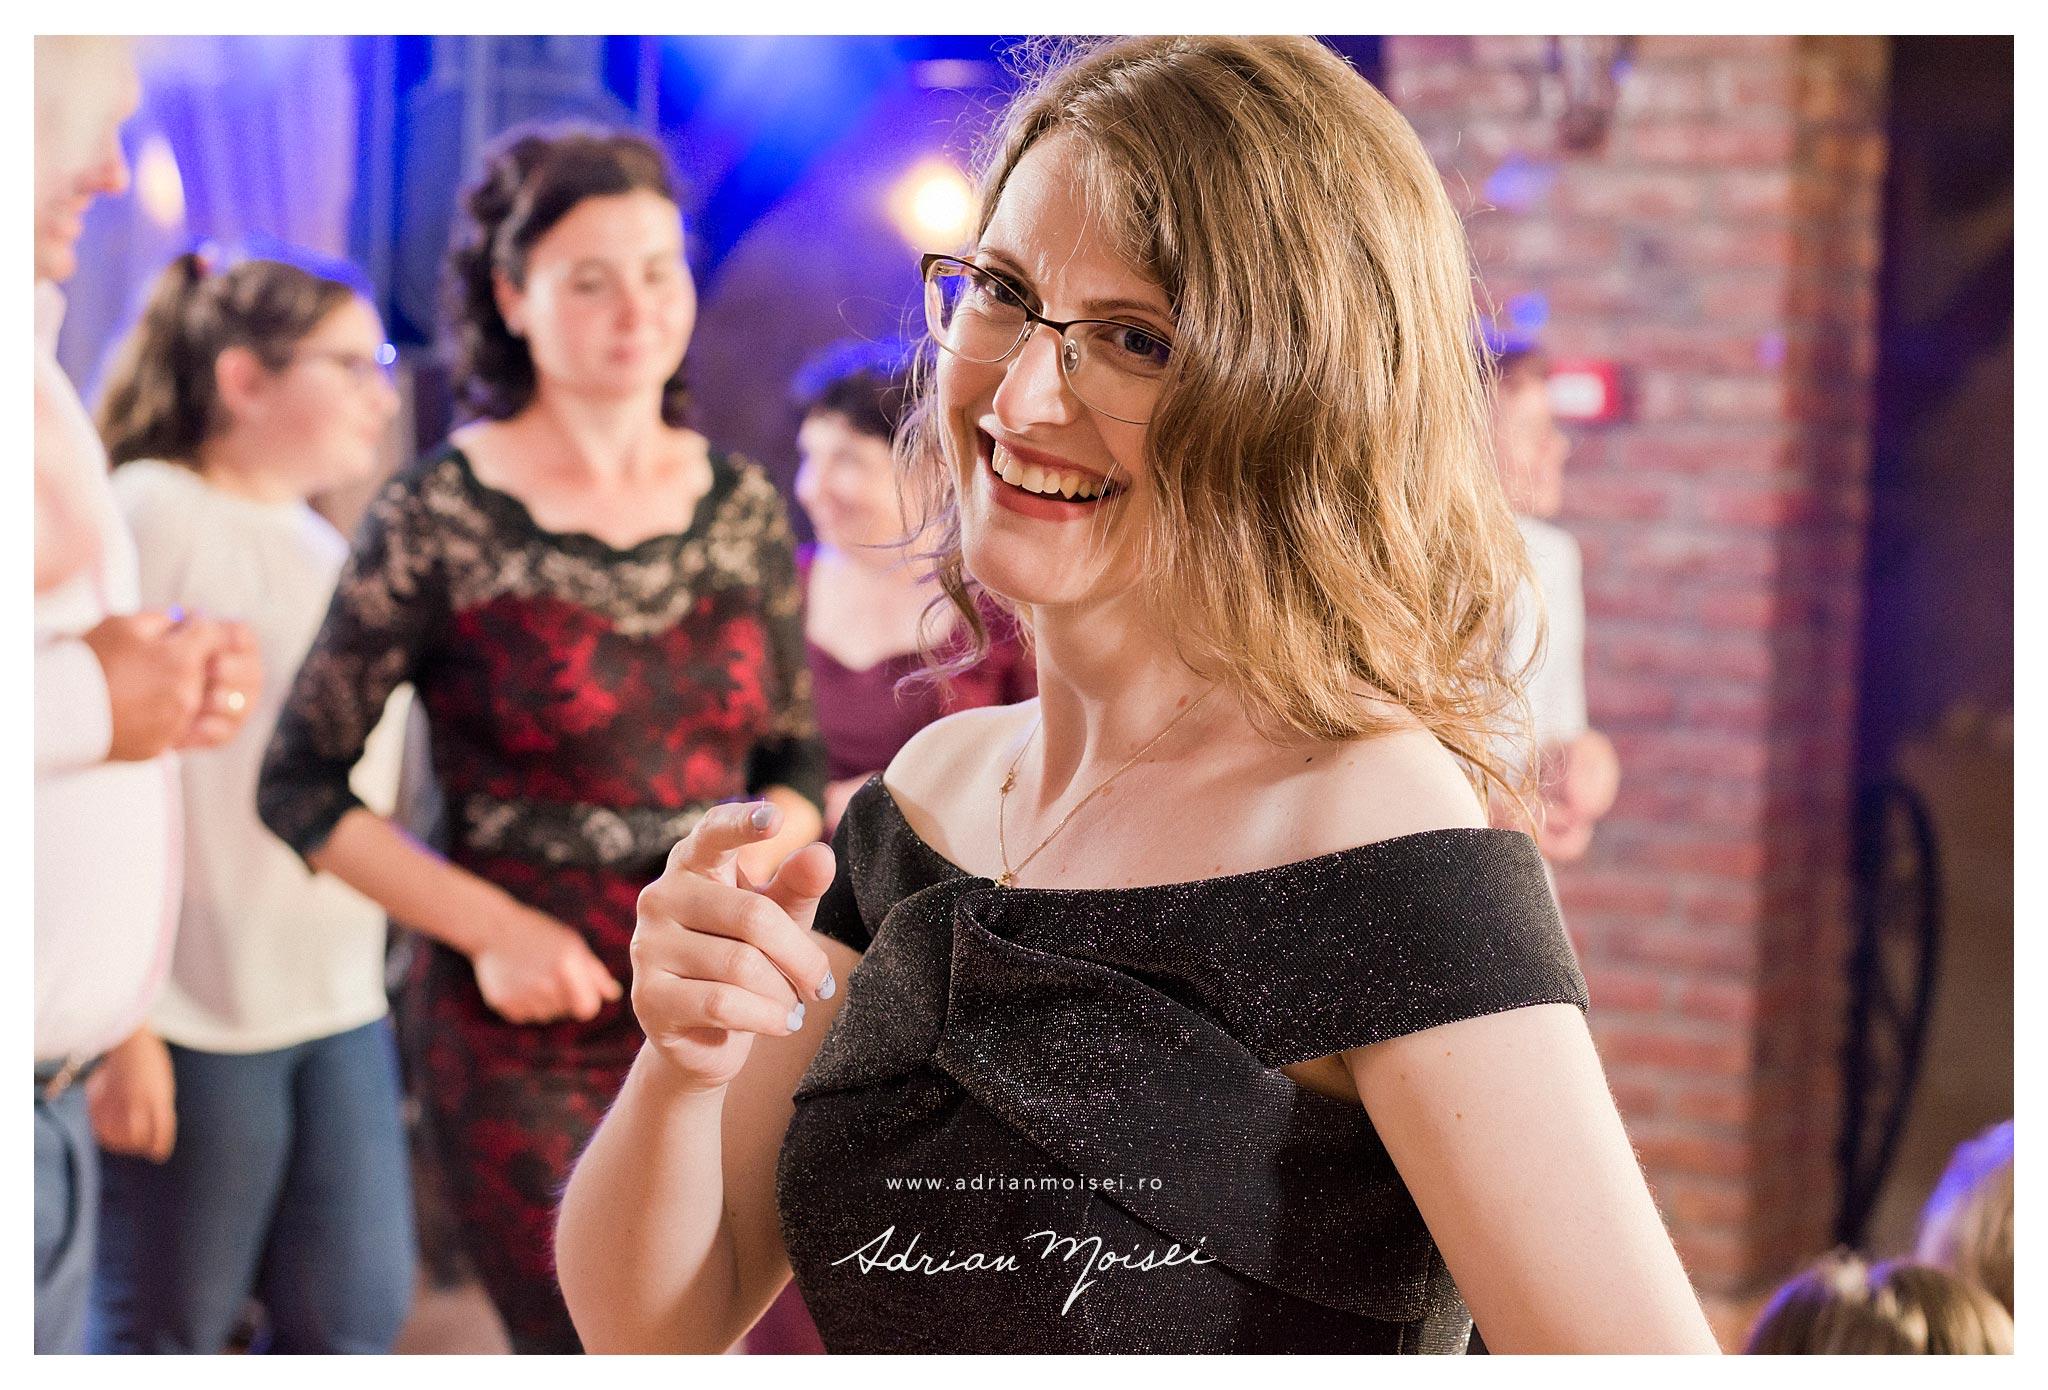 Fotografie de petrecere in Iasi, de Adrian Moisei